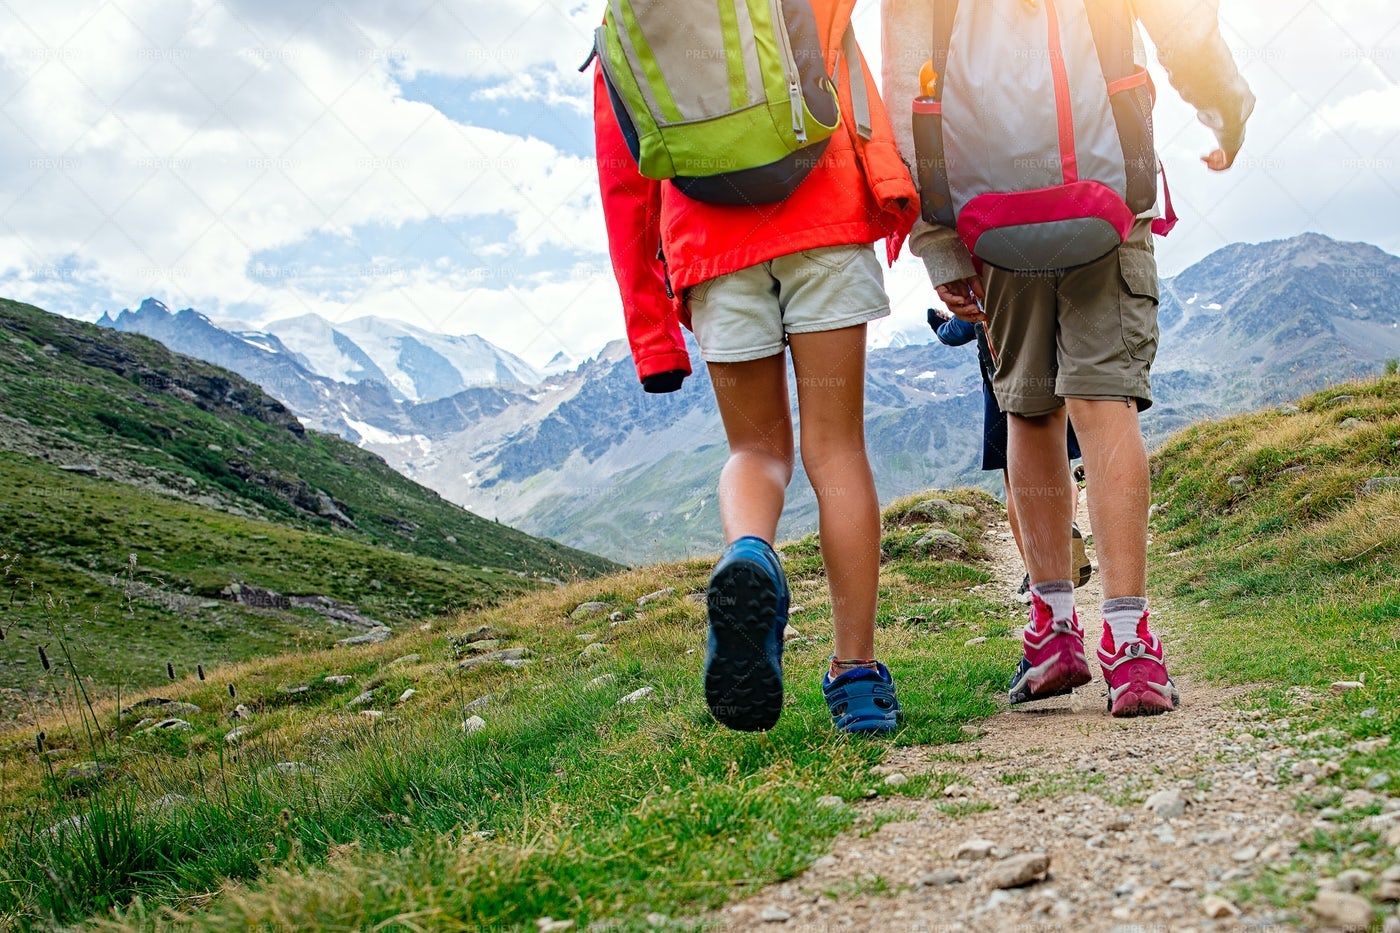 Kids Hiking A Mountain: Stock Photos